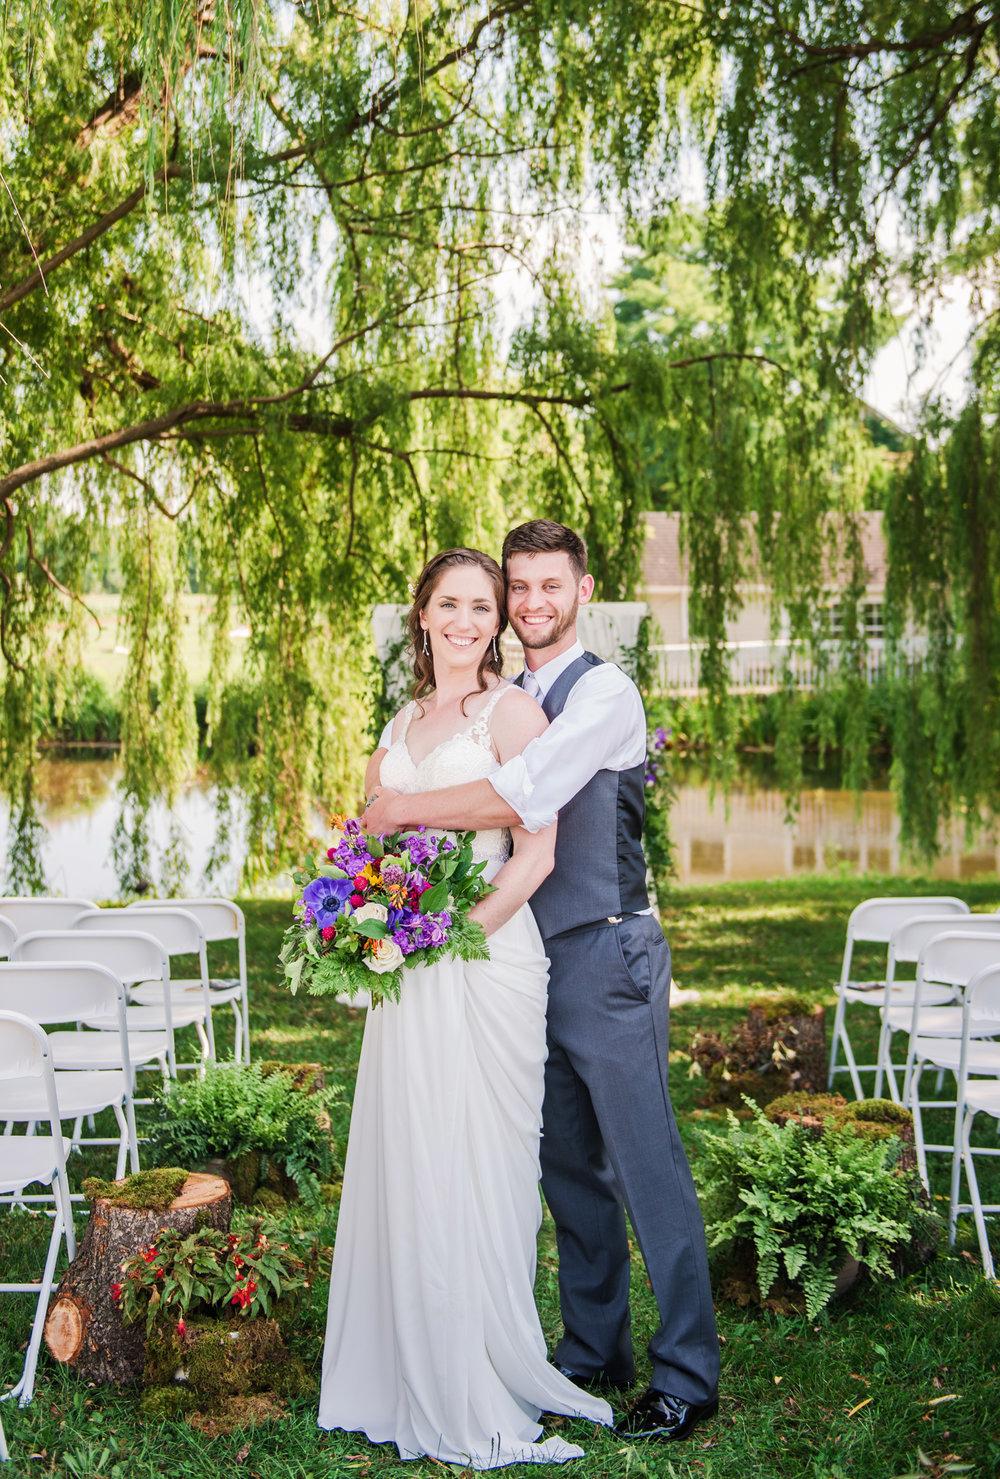 Jerris_Wadsworth_Wedding_Barn_Rochester_Wedding_JILL_STUDIO_Rochester_NY_Photographer_DSC_2495.jpg